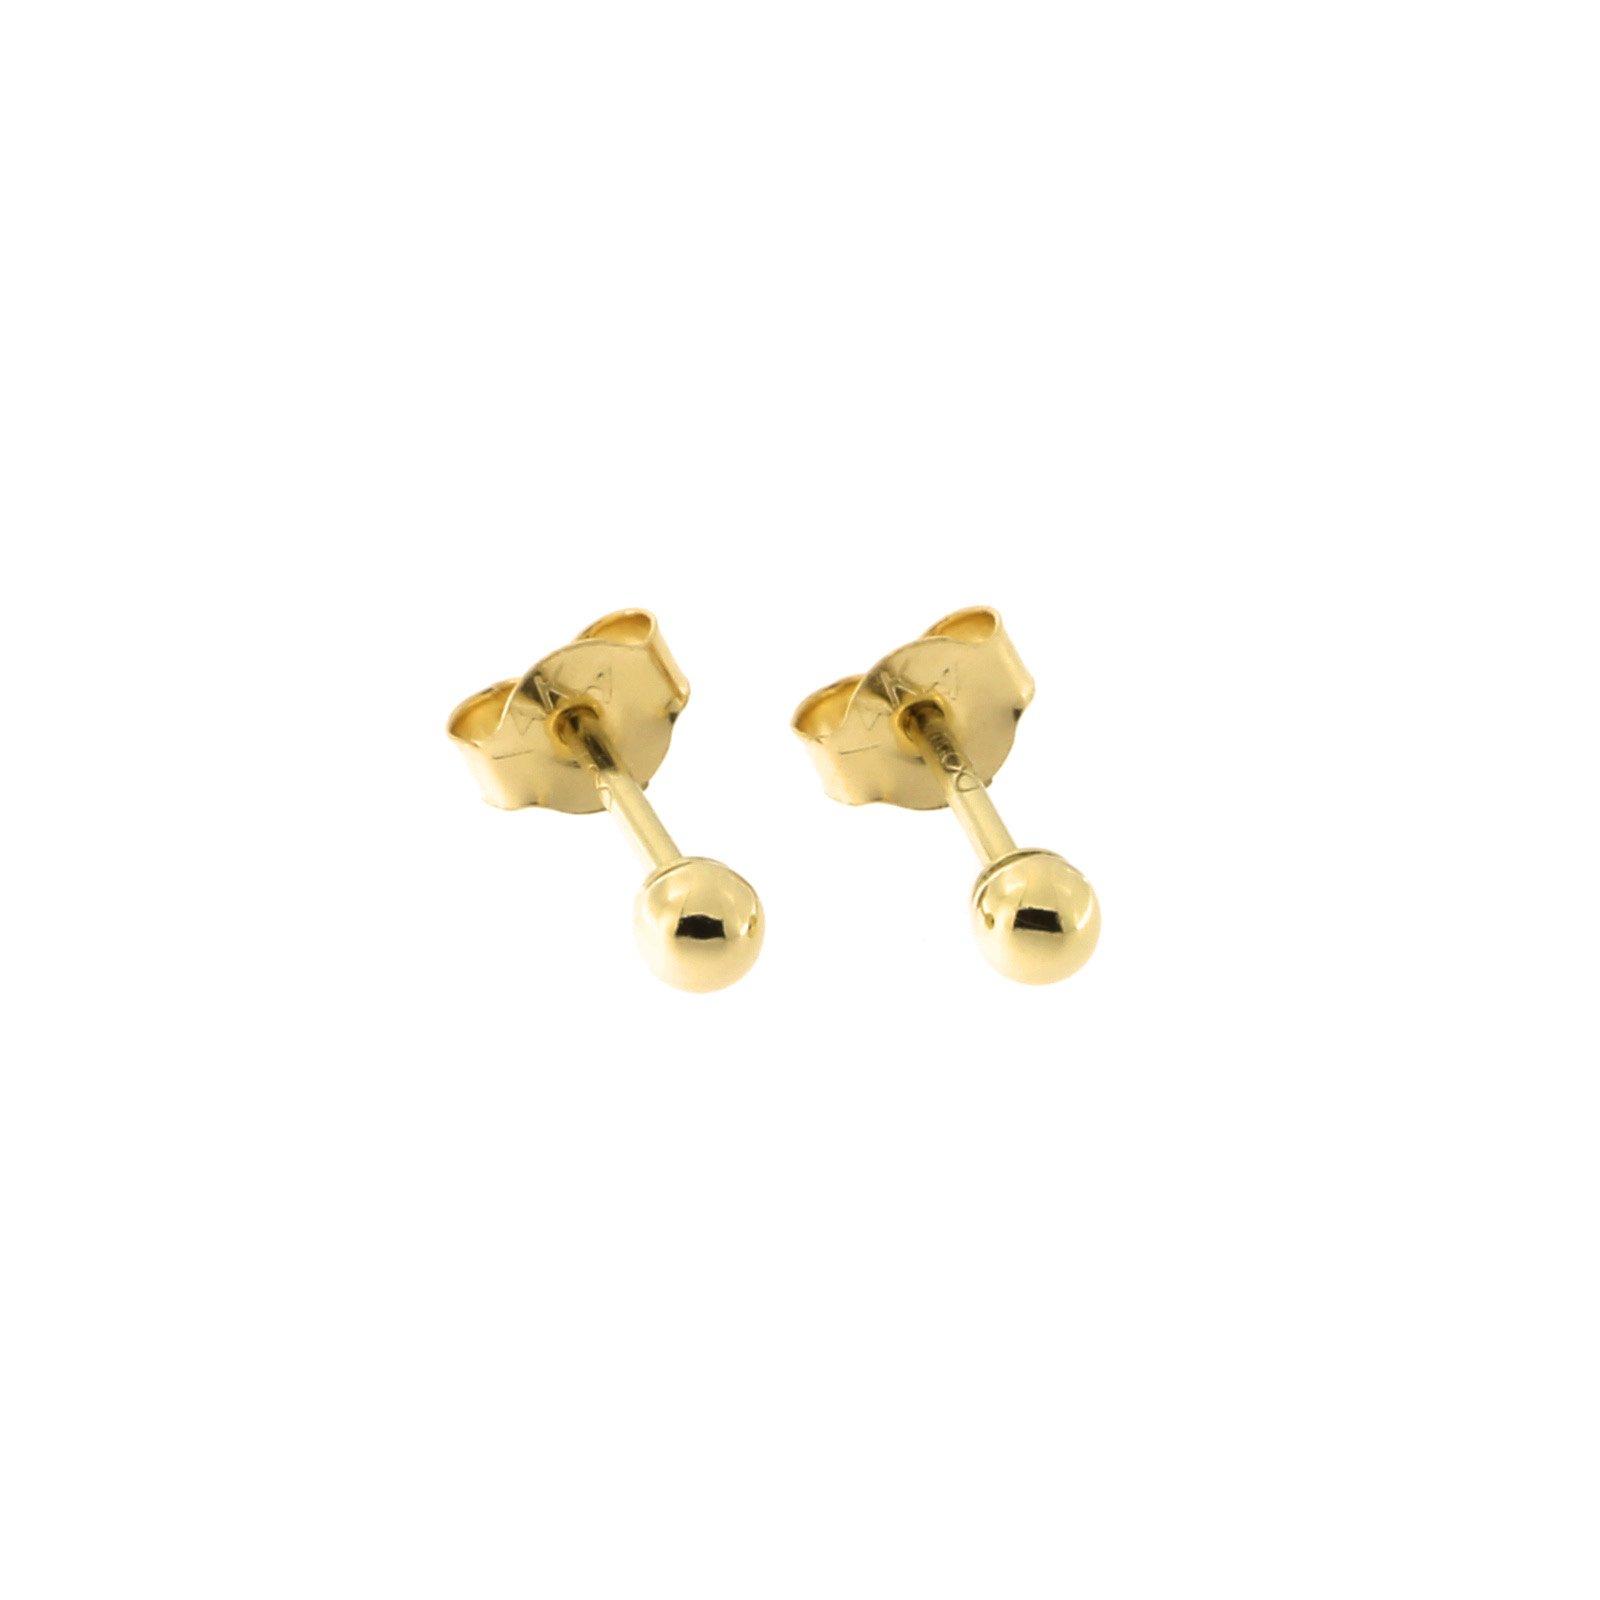 14 Karat Yellow Gold Round Bead Ball Stud Earrings, 2 Millimeters by Beauniq